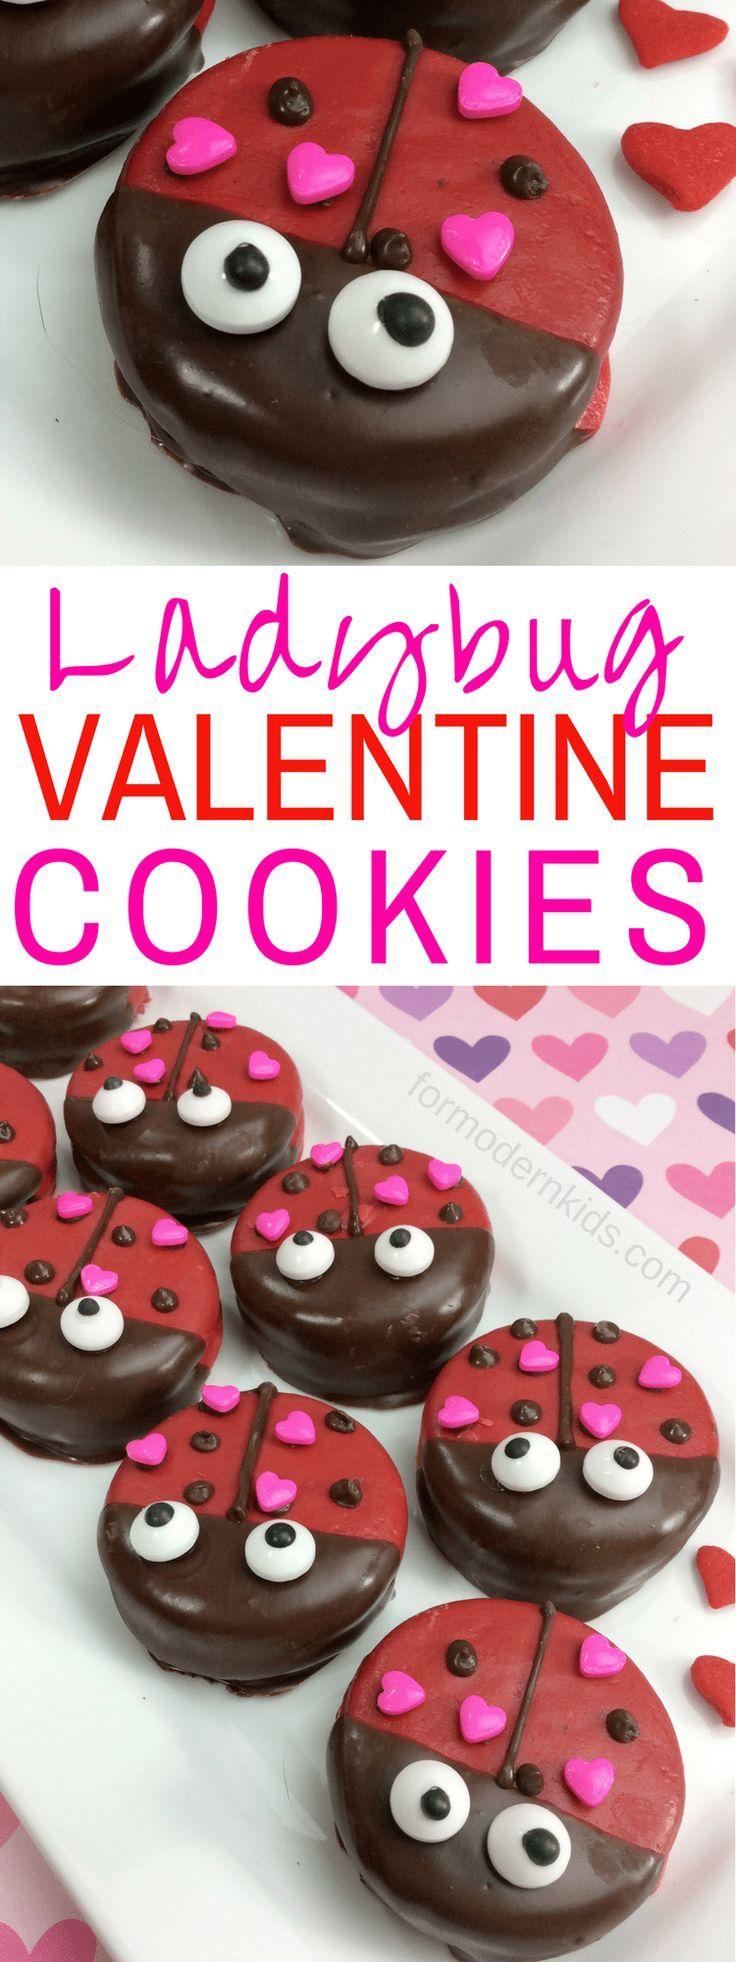 Valentine S Day Ladybug Oreo Treats For Kids Kbn Valentine S Day